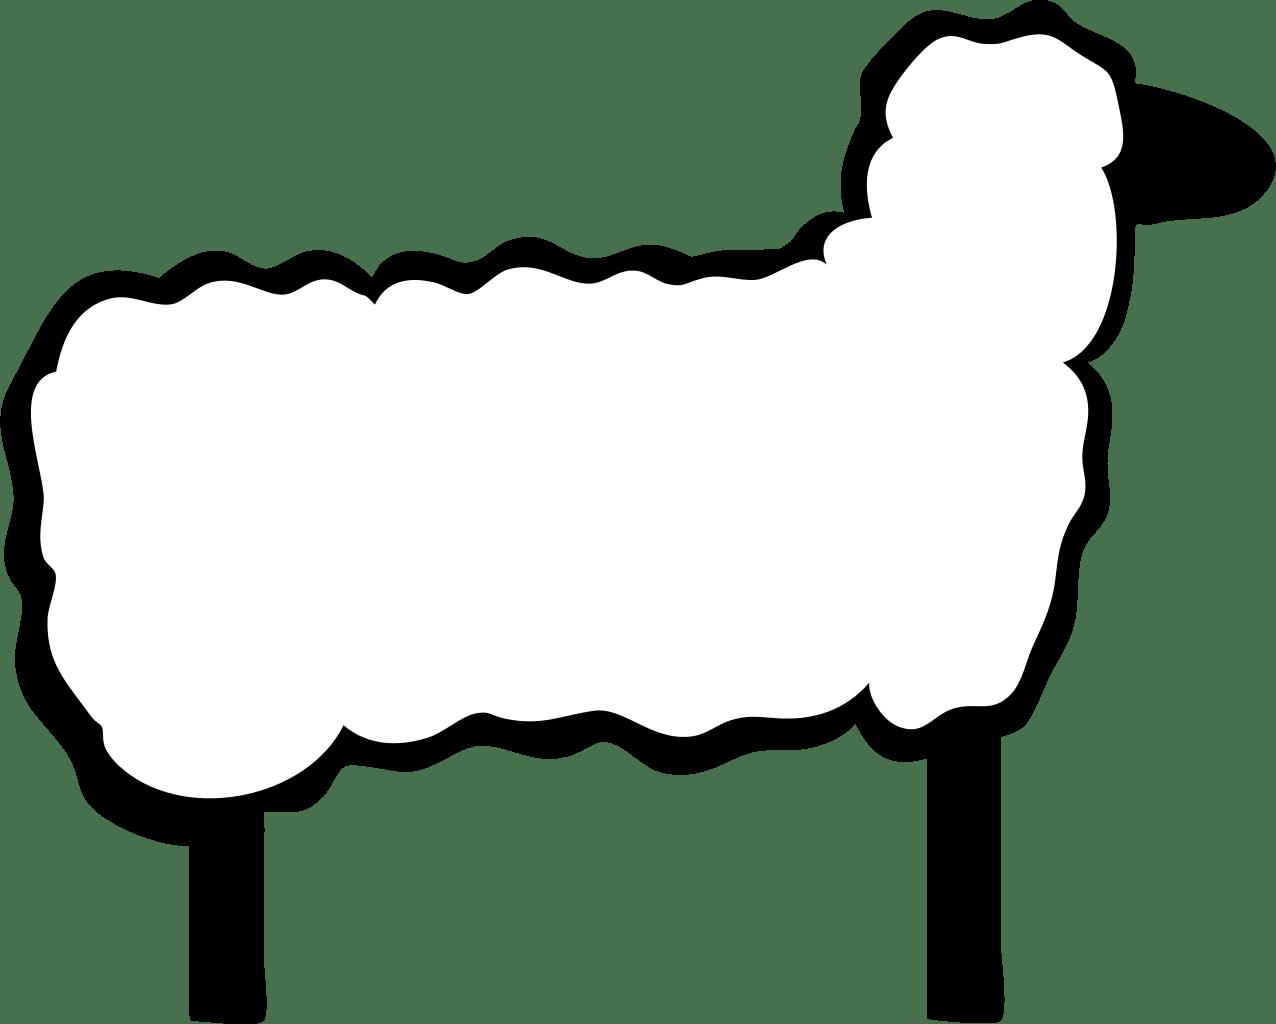 Sheep Black And White Sheep Clipart Black And White Free